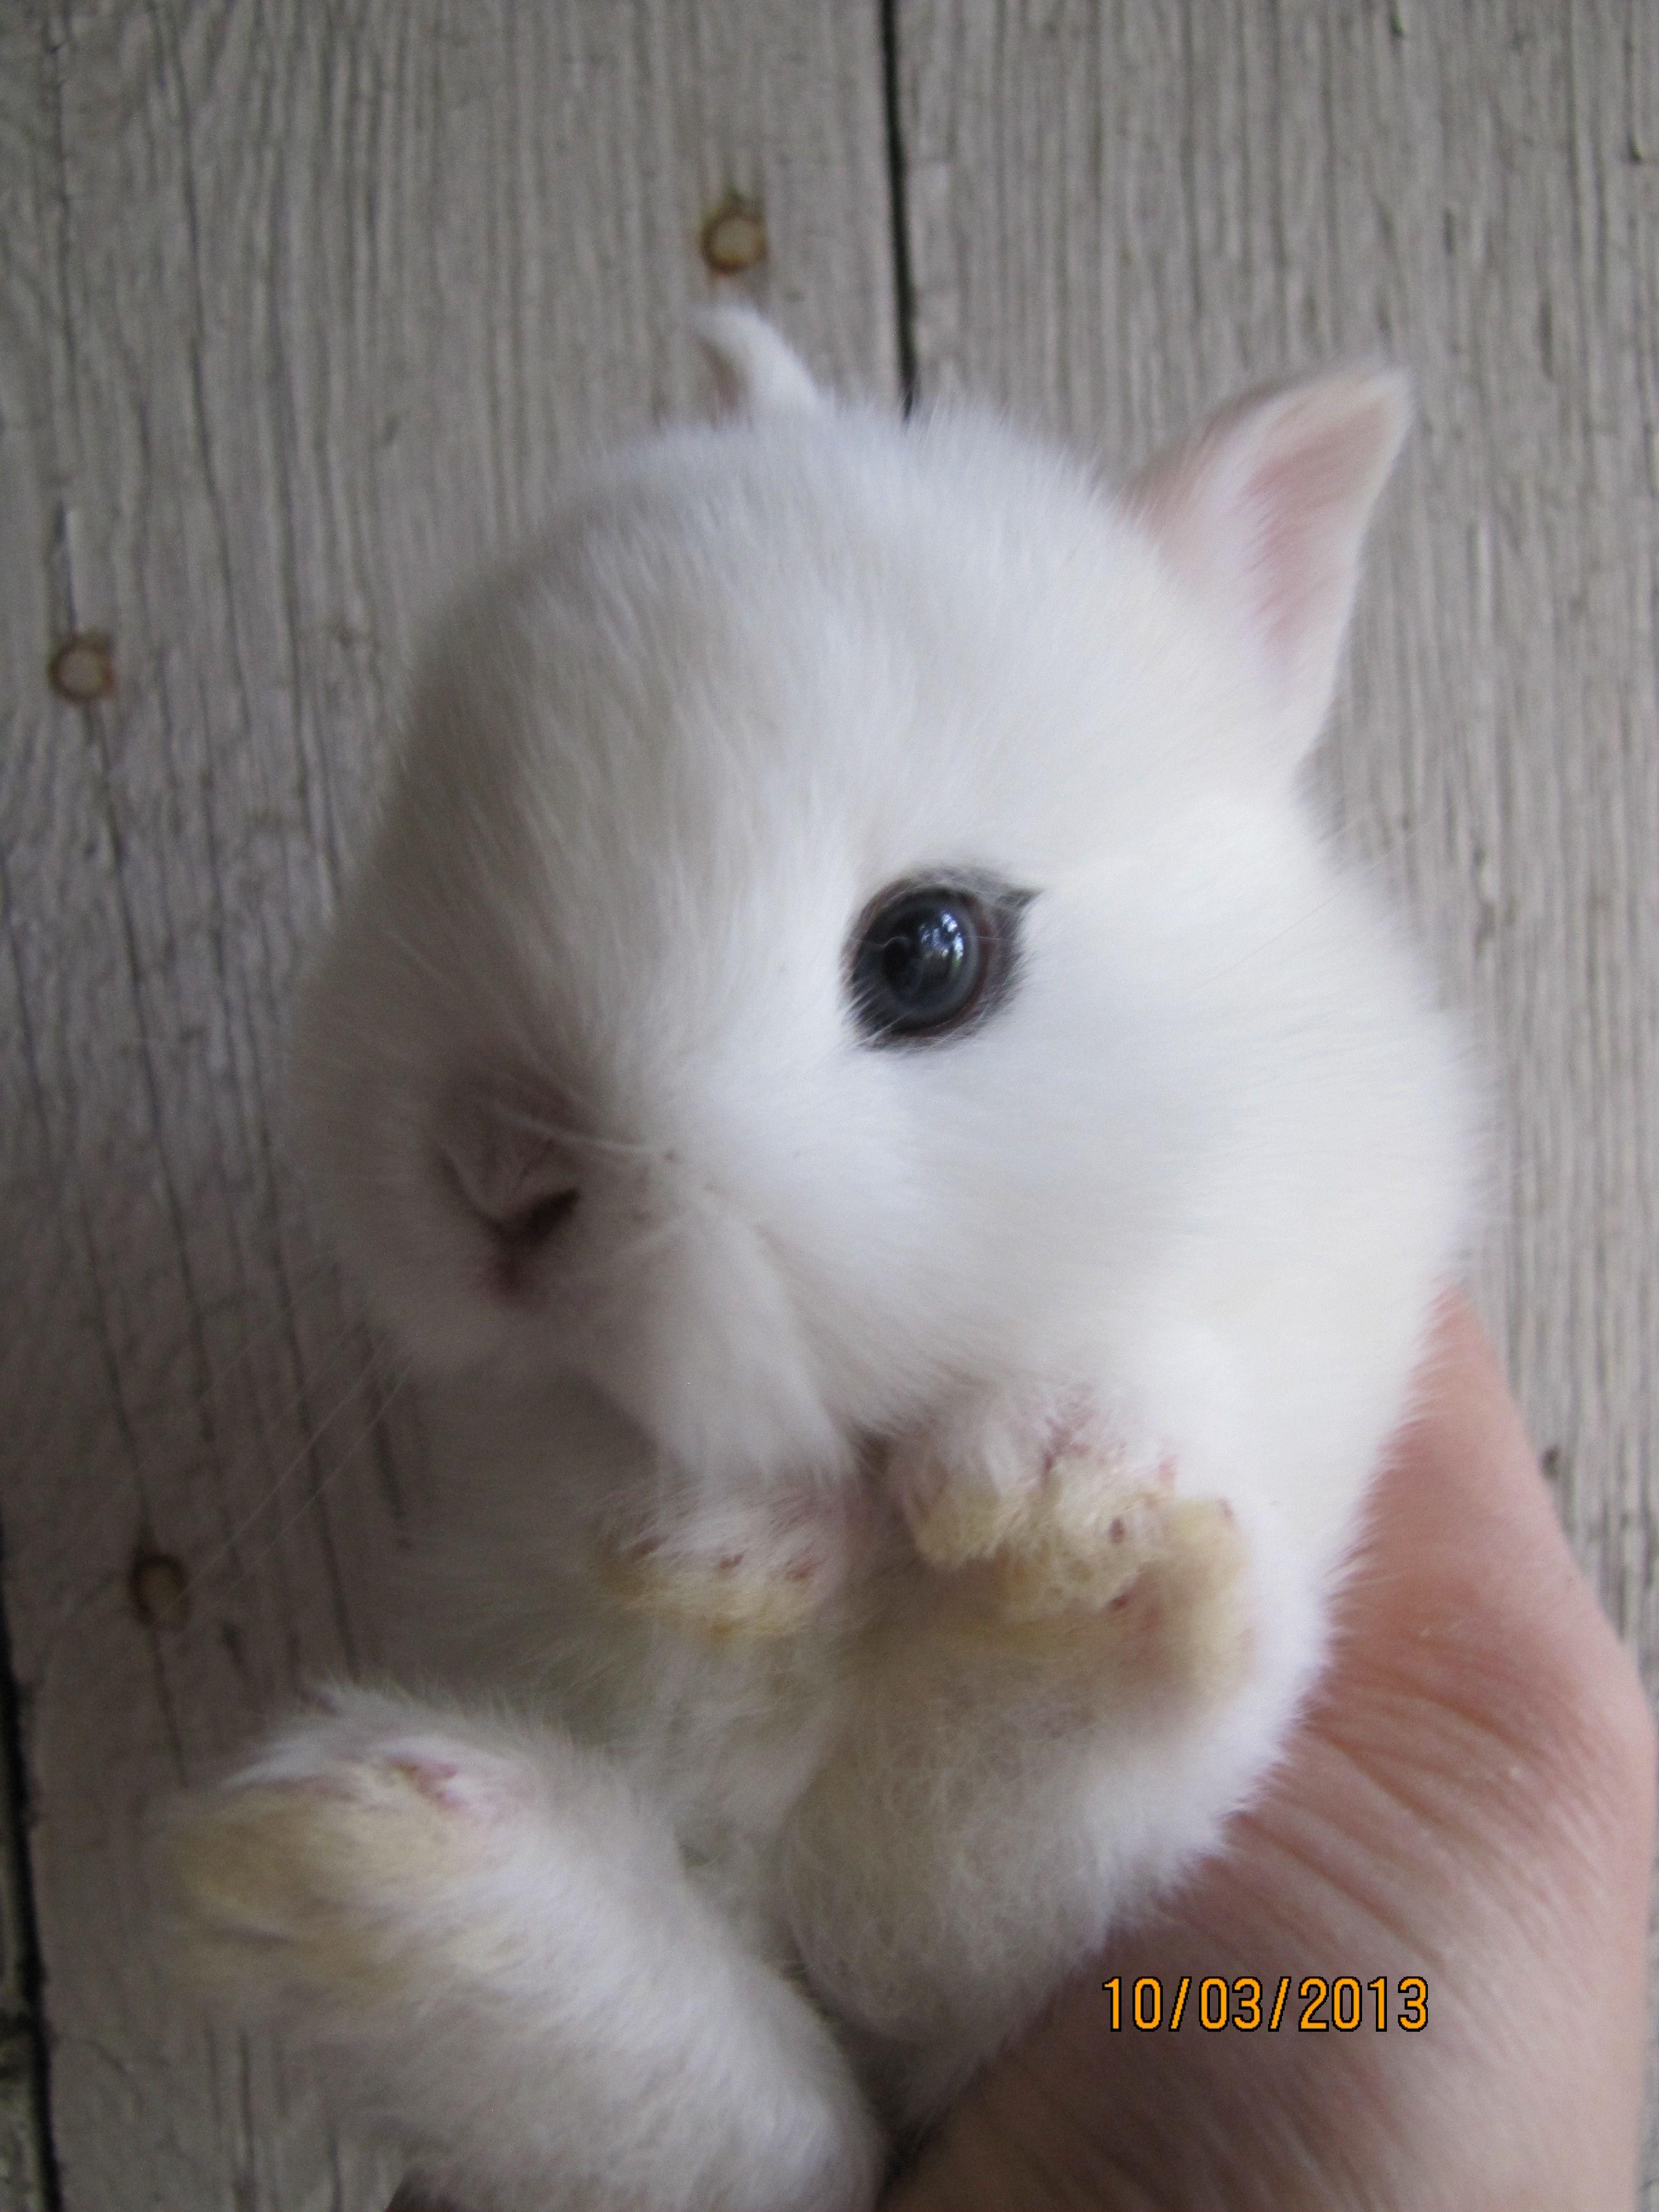 A 18 day old Dwarf Hotot bunny. So cute!